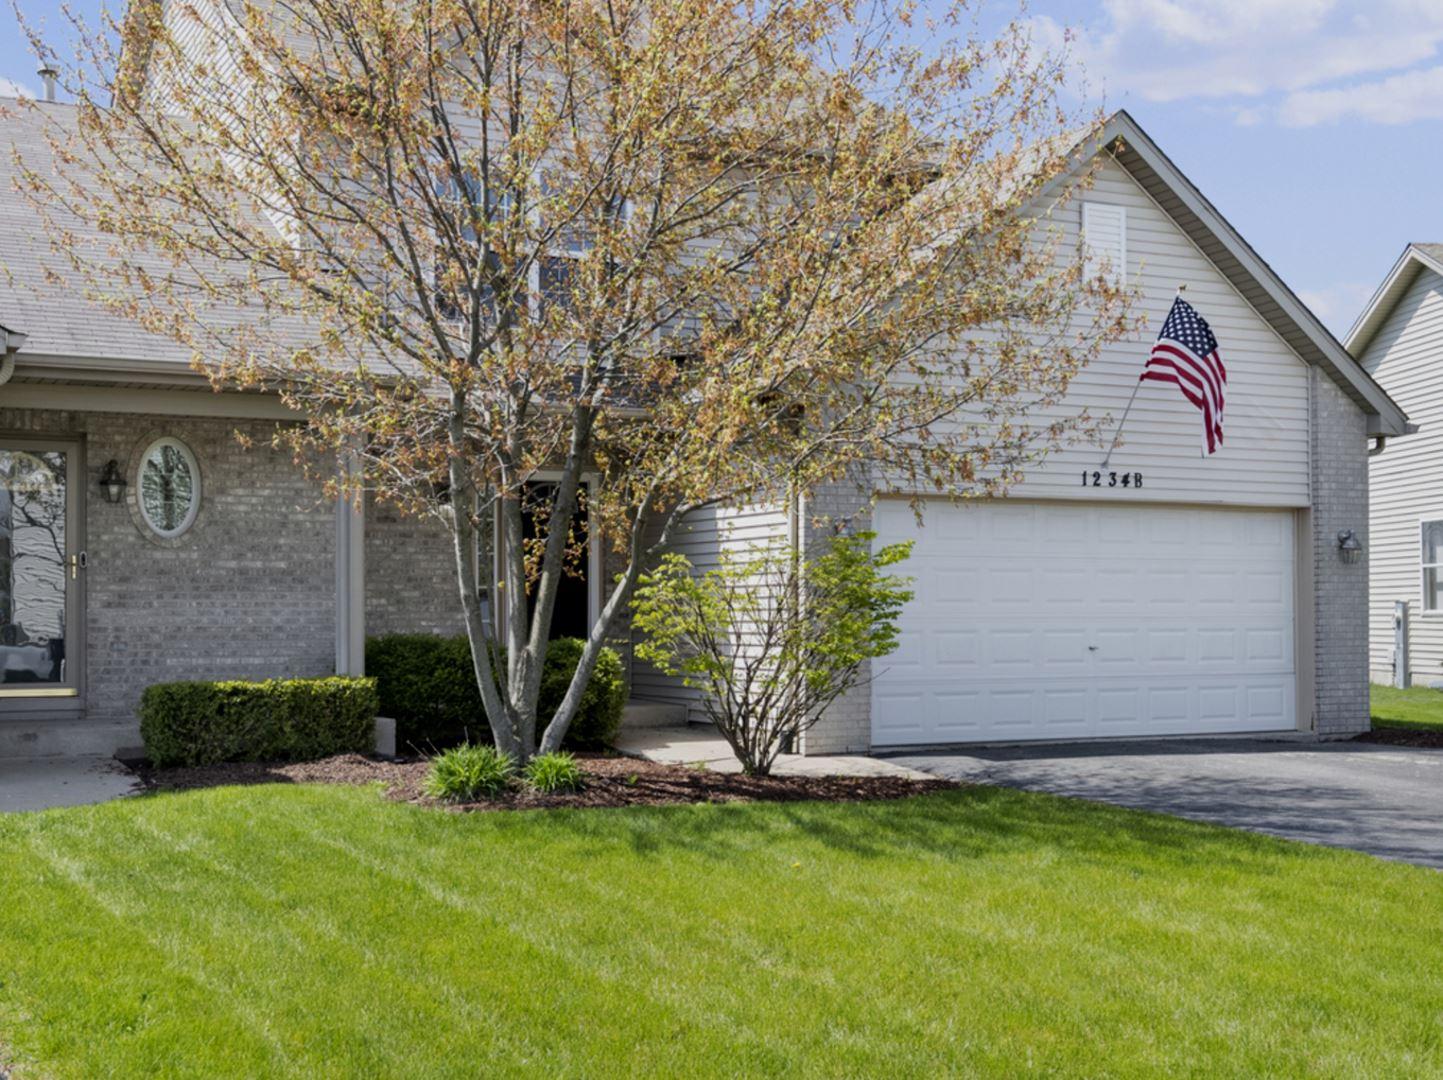 Photo of 1234 Glen Mor Drive #B, Shorewood, IL 60404 (MLS # 11067899)